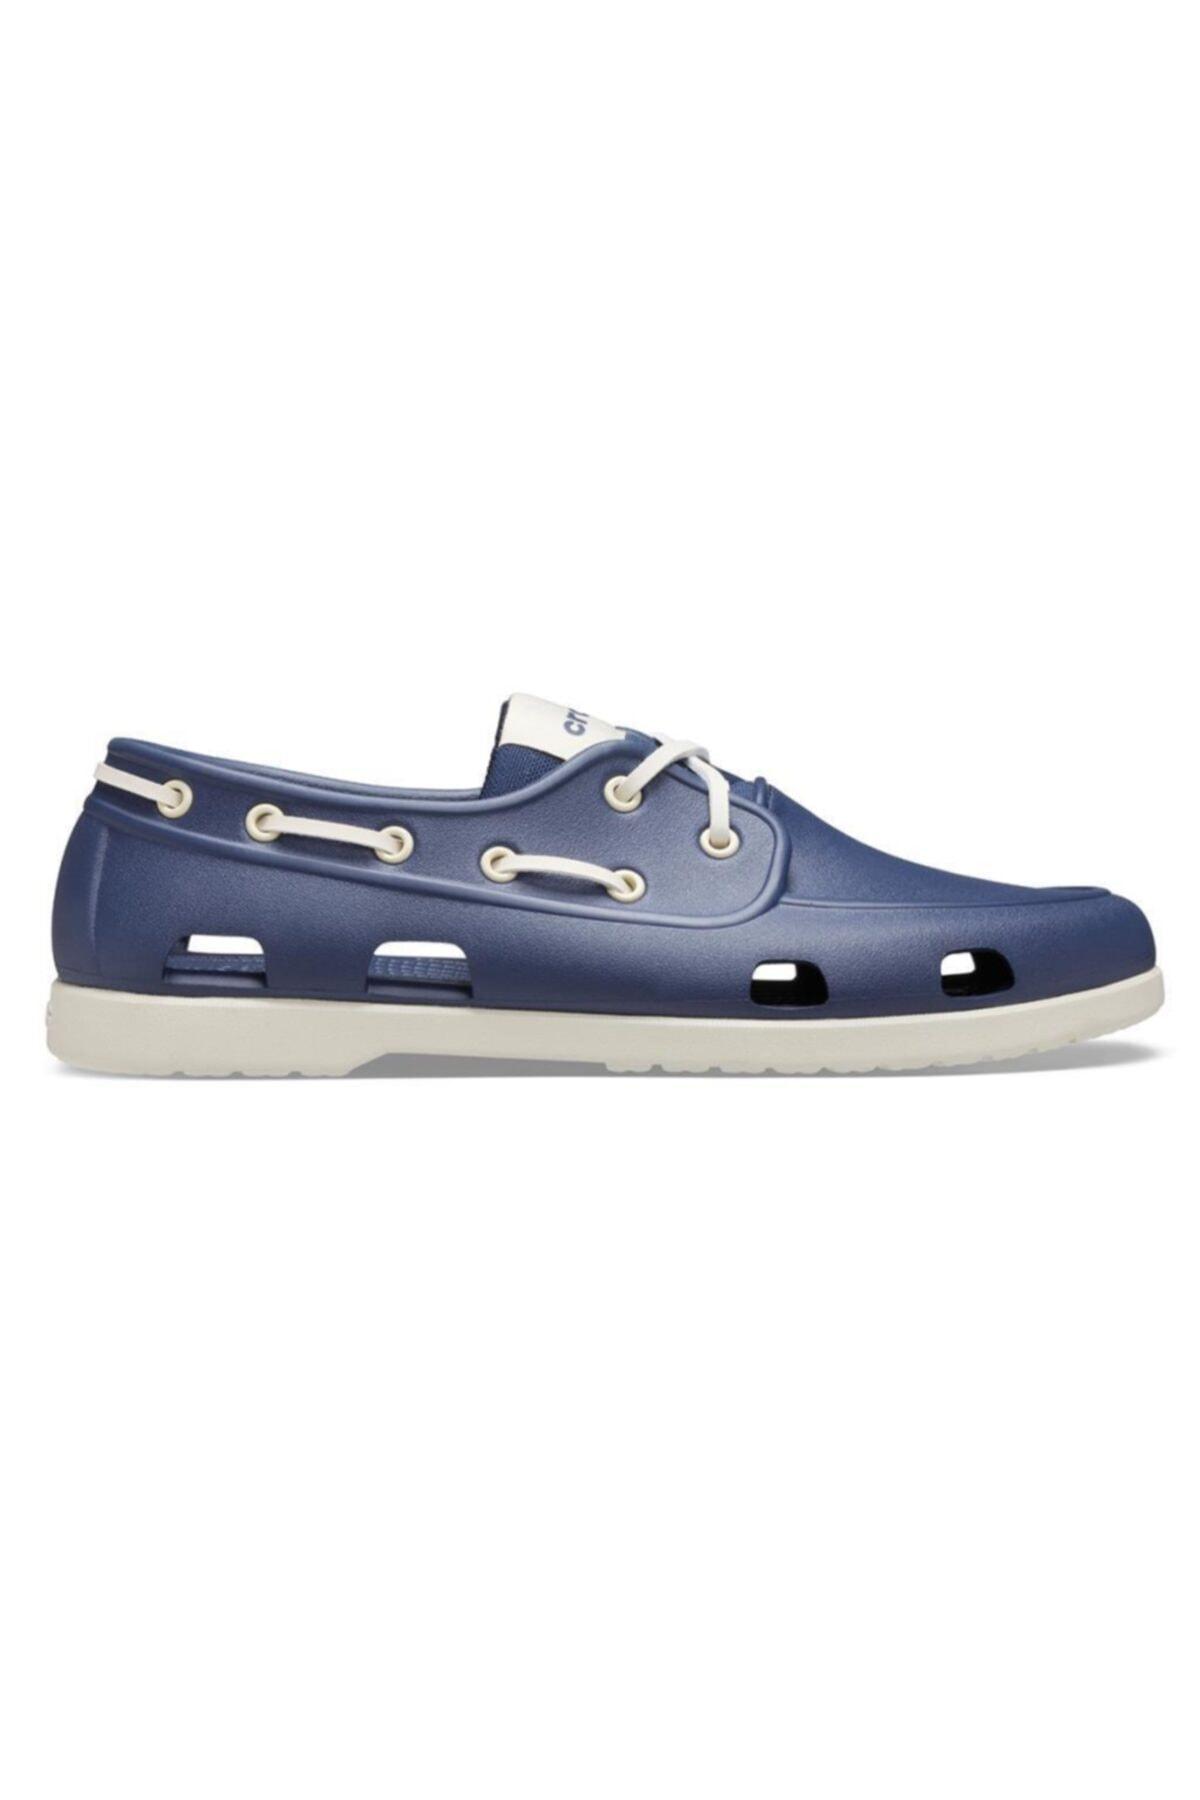 Classic Boat Shoe M Cr0946 46k